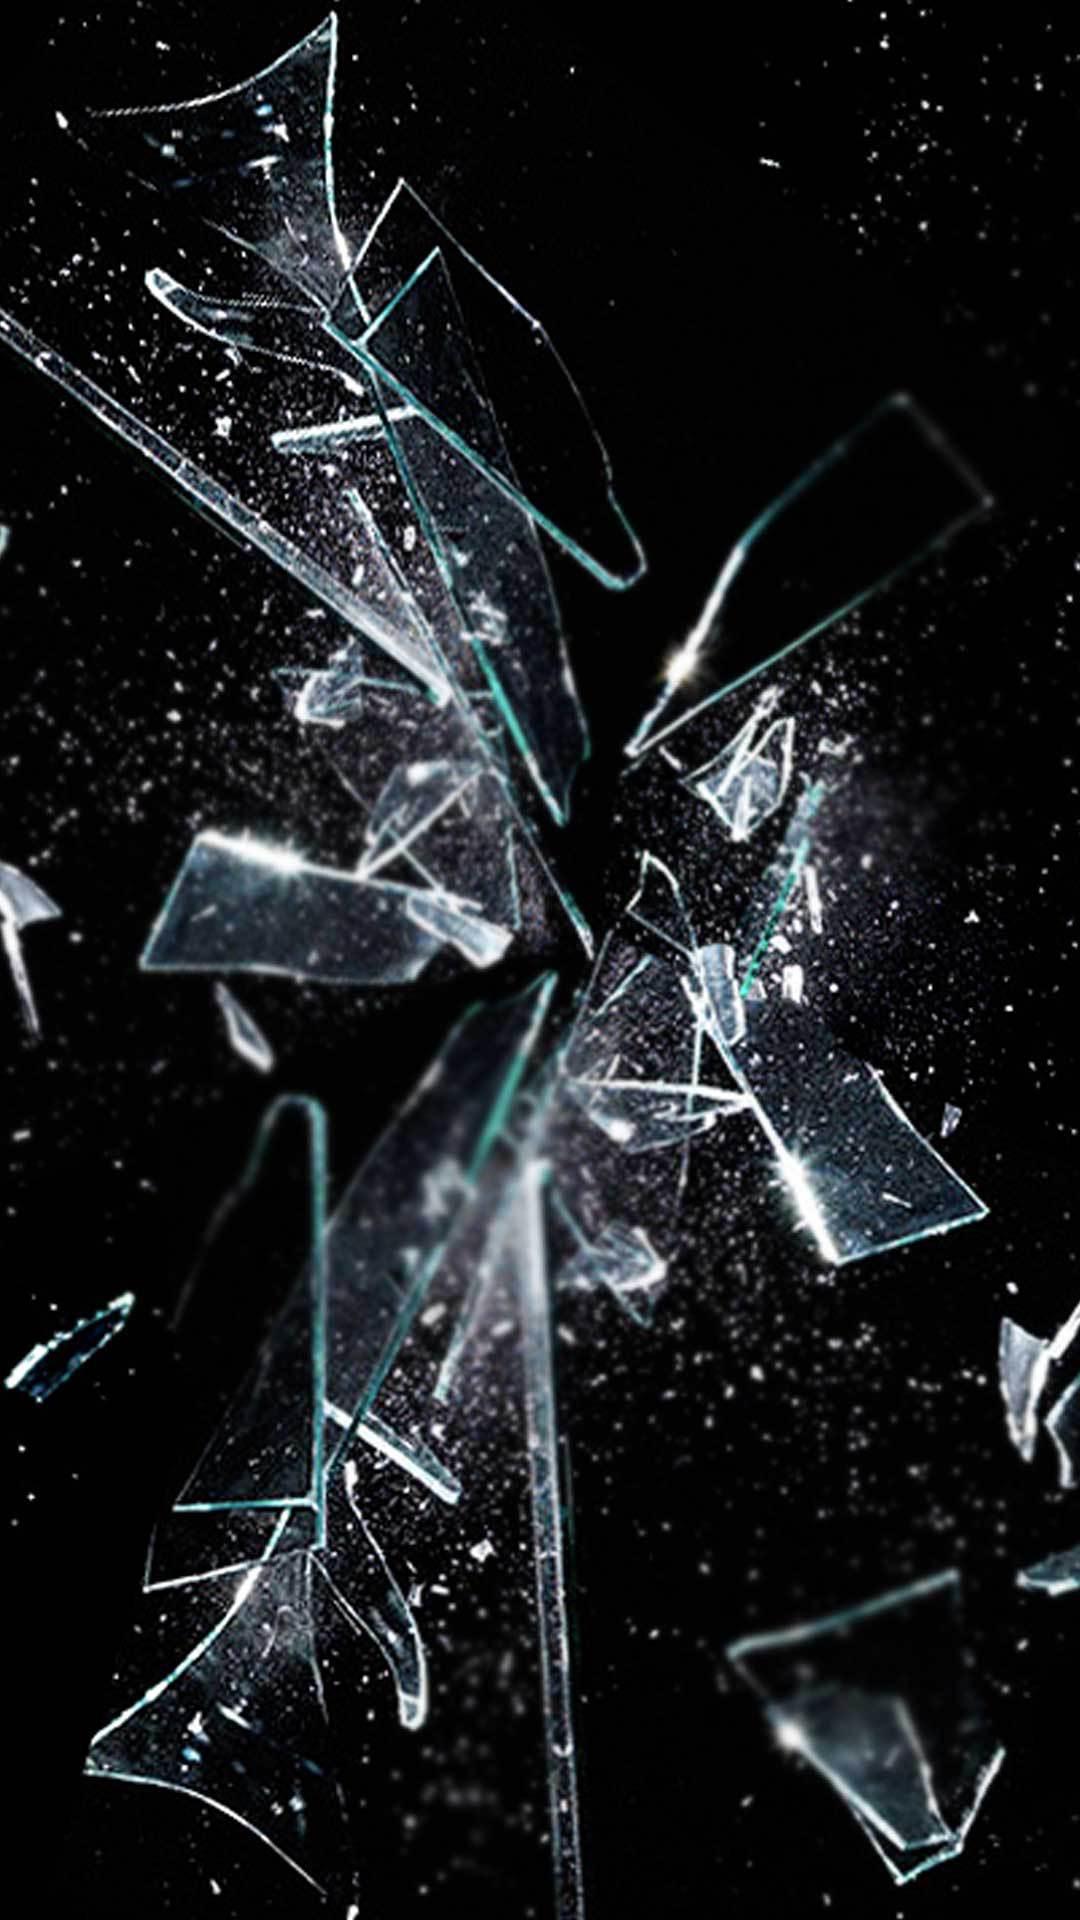 Iphone 7 Plus Cracked Screen - HD Wallpaper